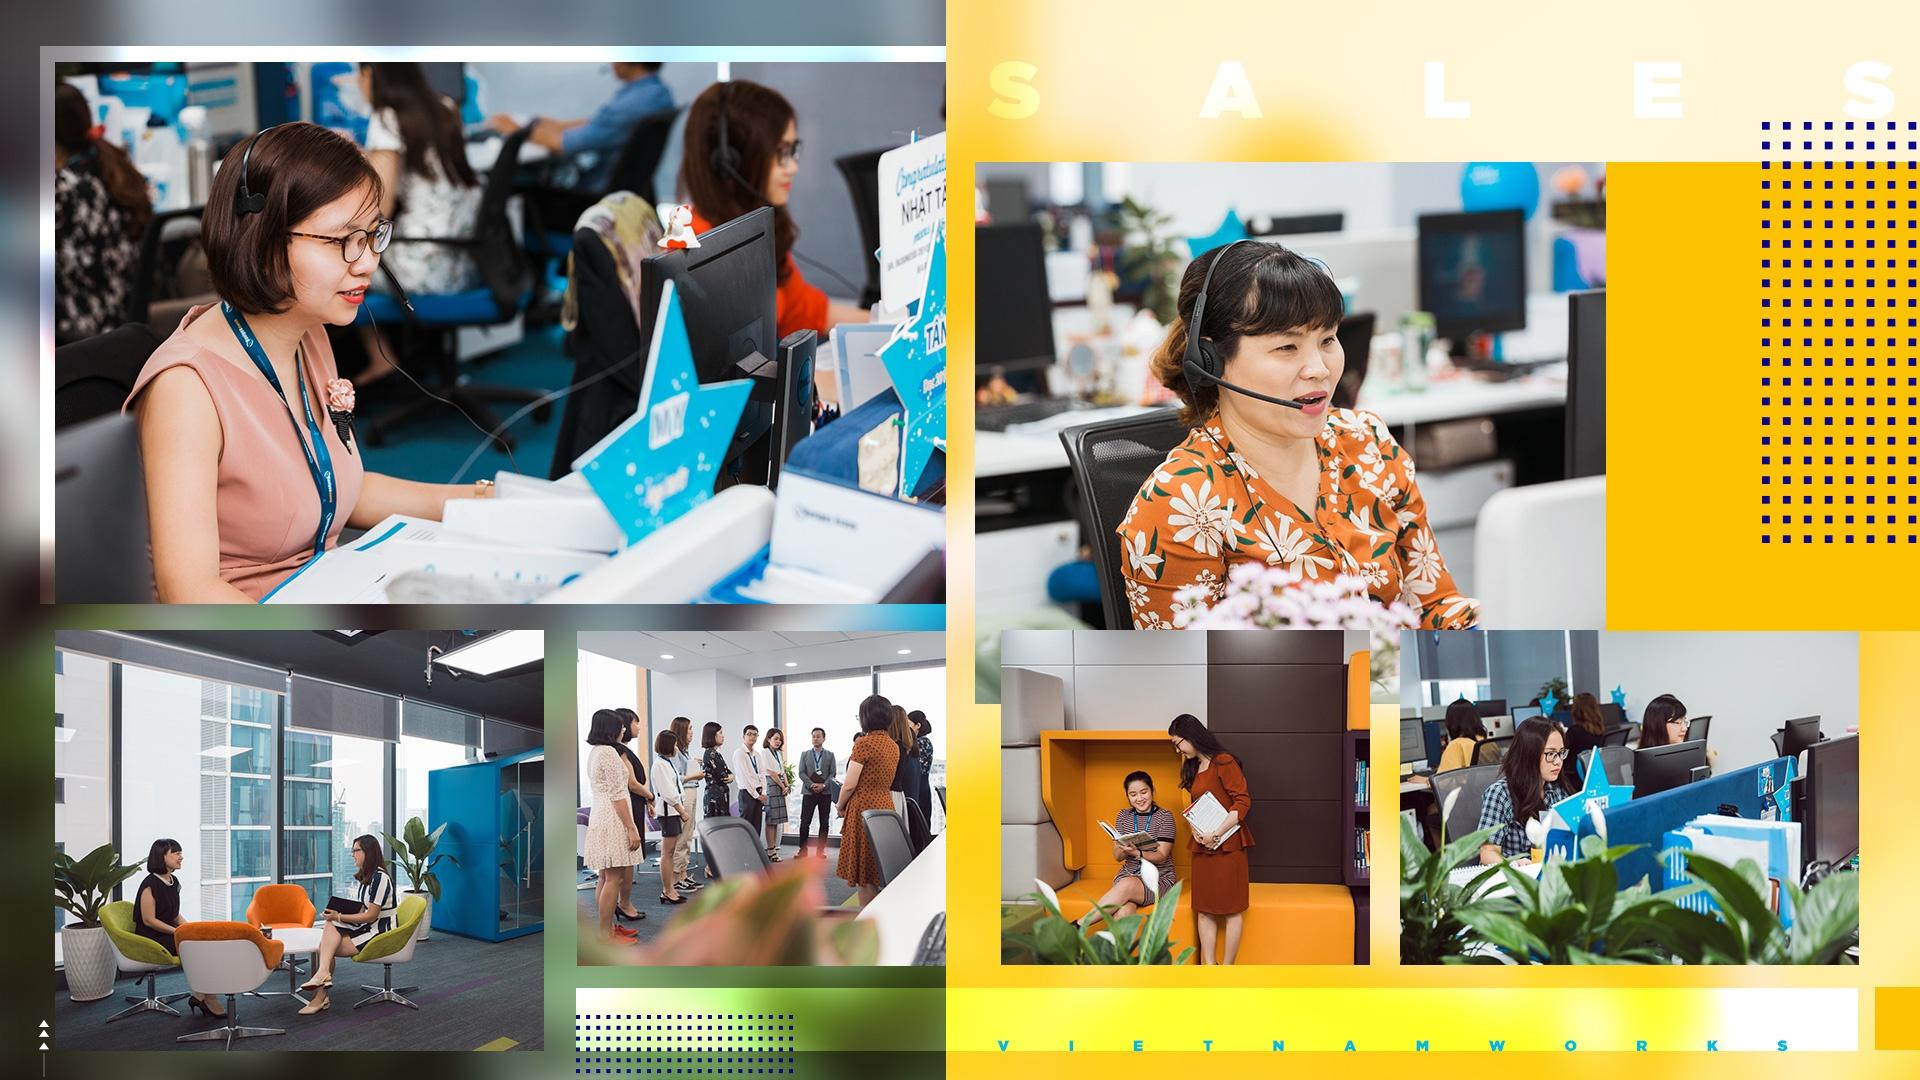 Giam doc KD VietnamWorks: 'Sales khong phai nghe di xin, ma la di cho' hinh anh 12